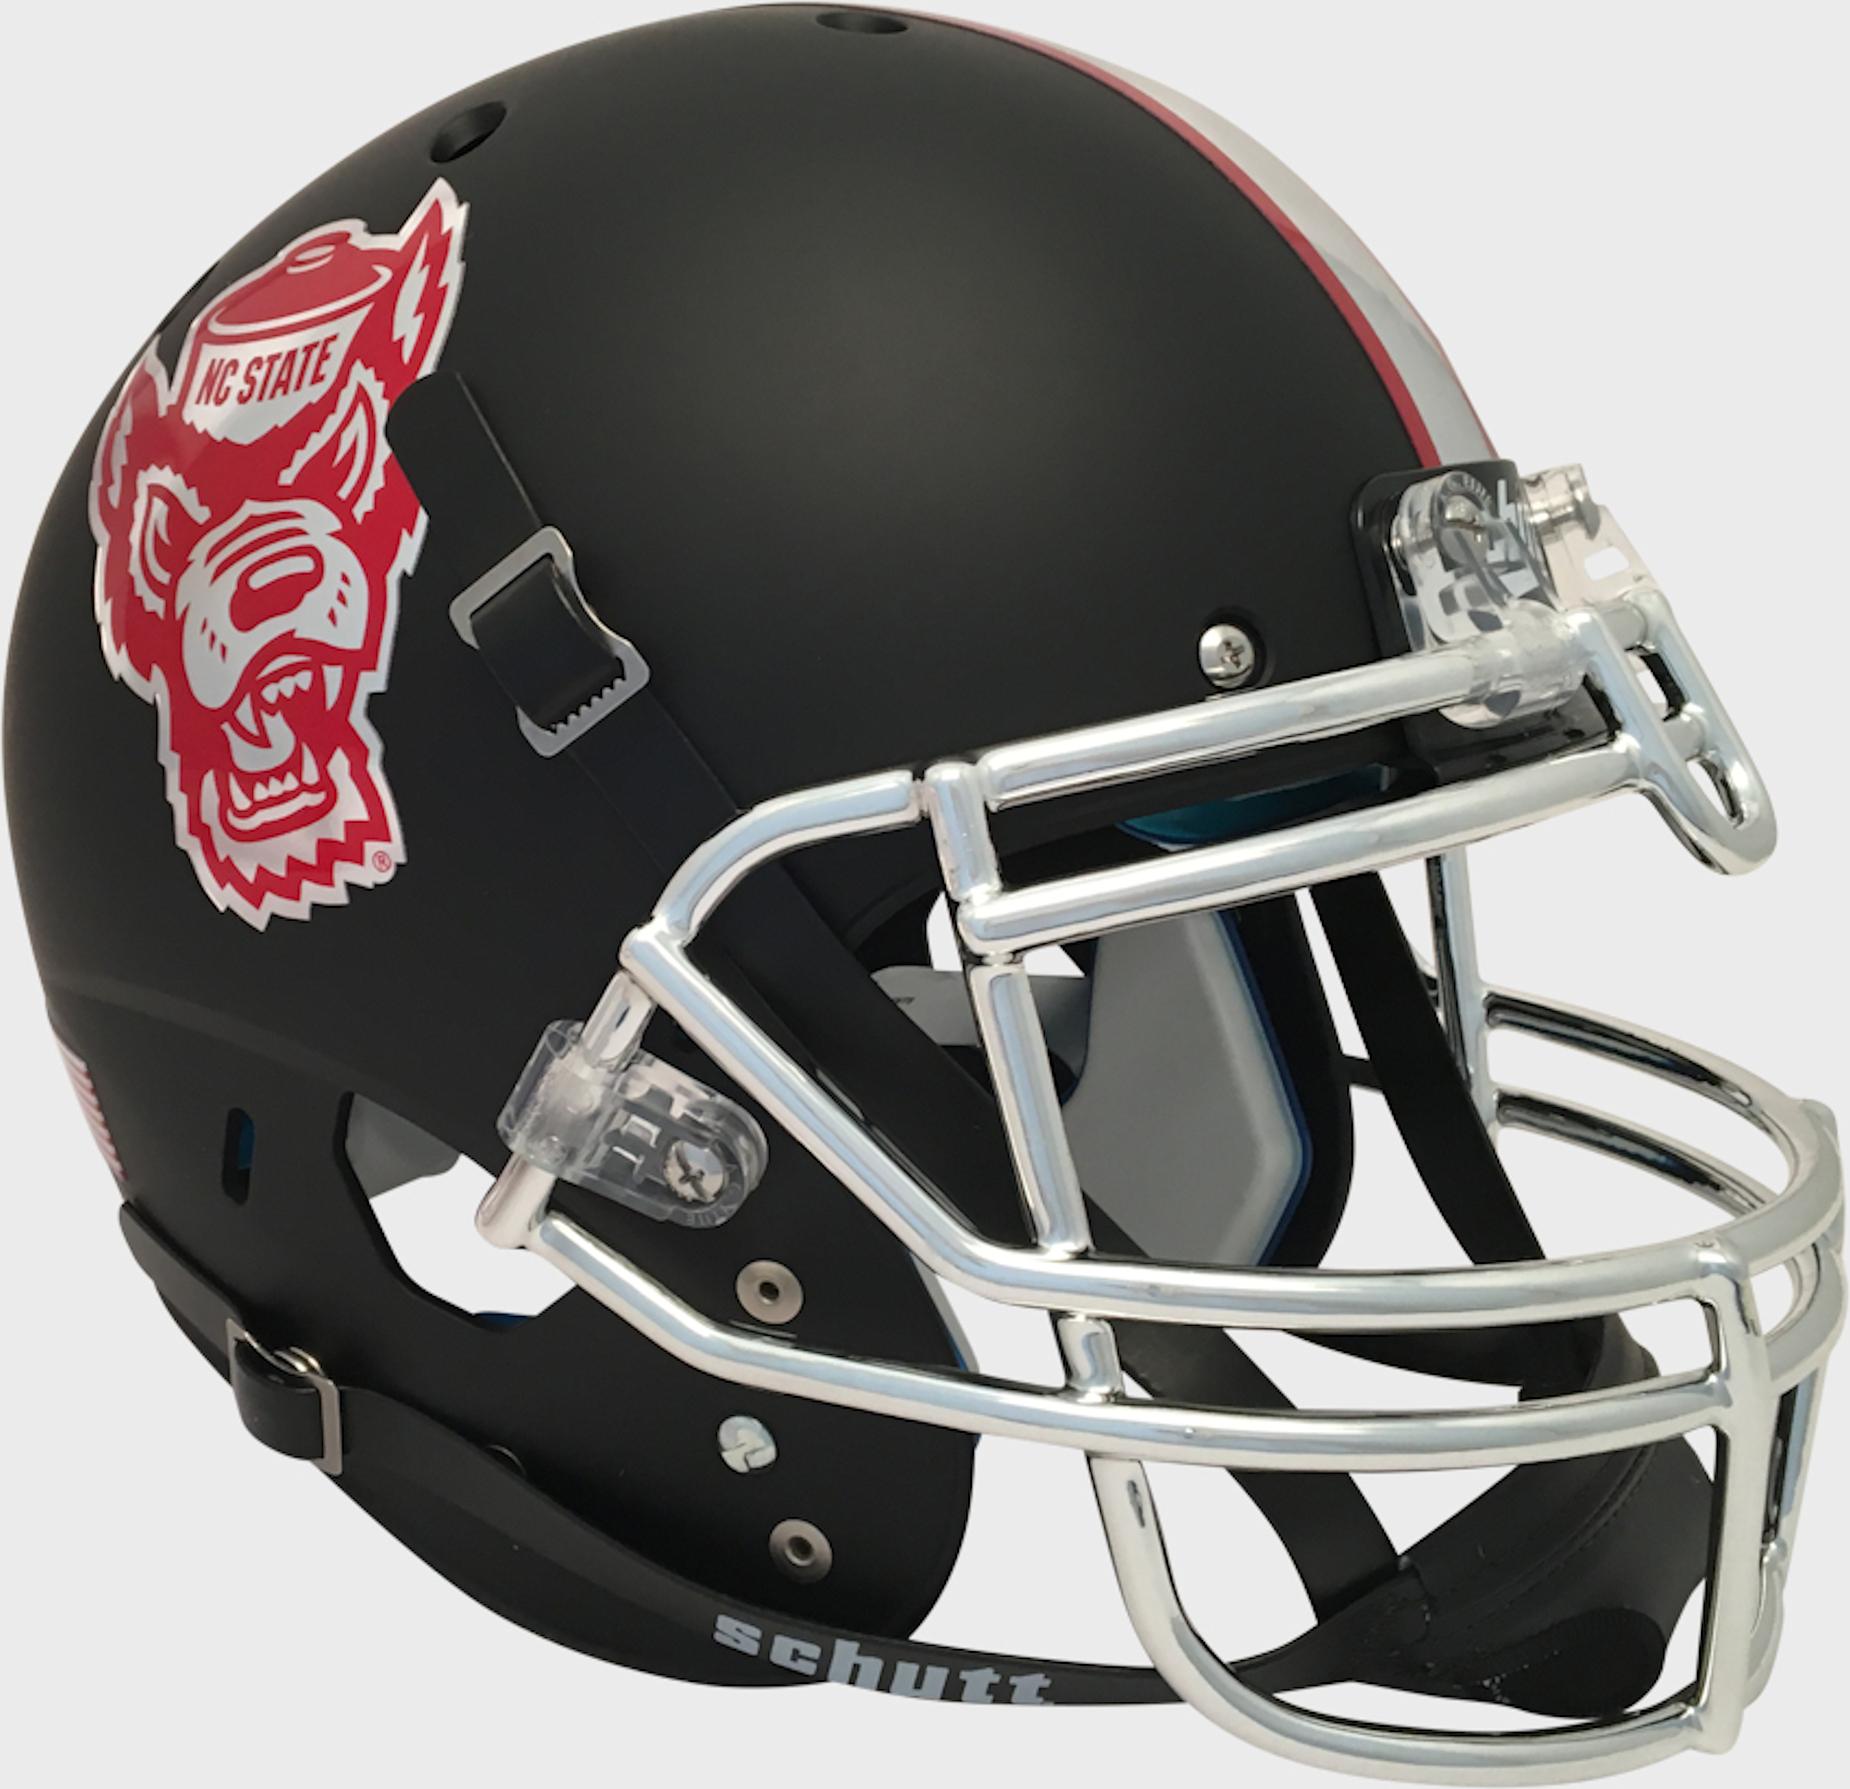 North Carolina State Wolfpack Authentic College XP Football Helmet Schutt <B>Matte Black</B>